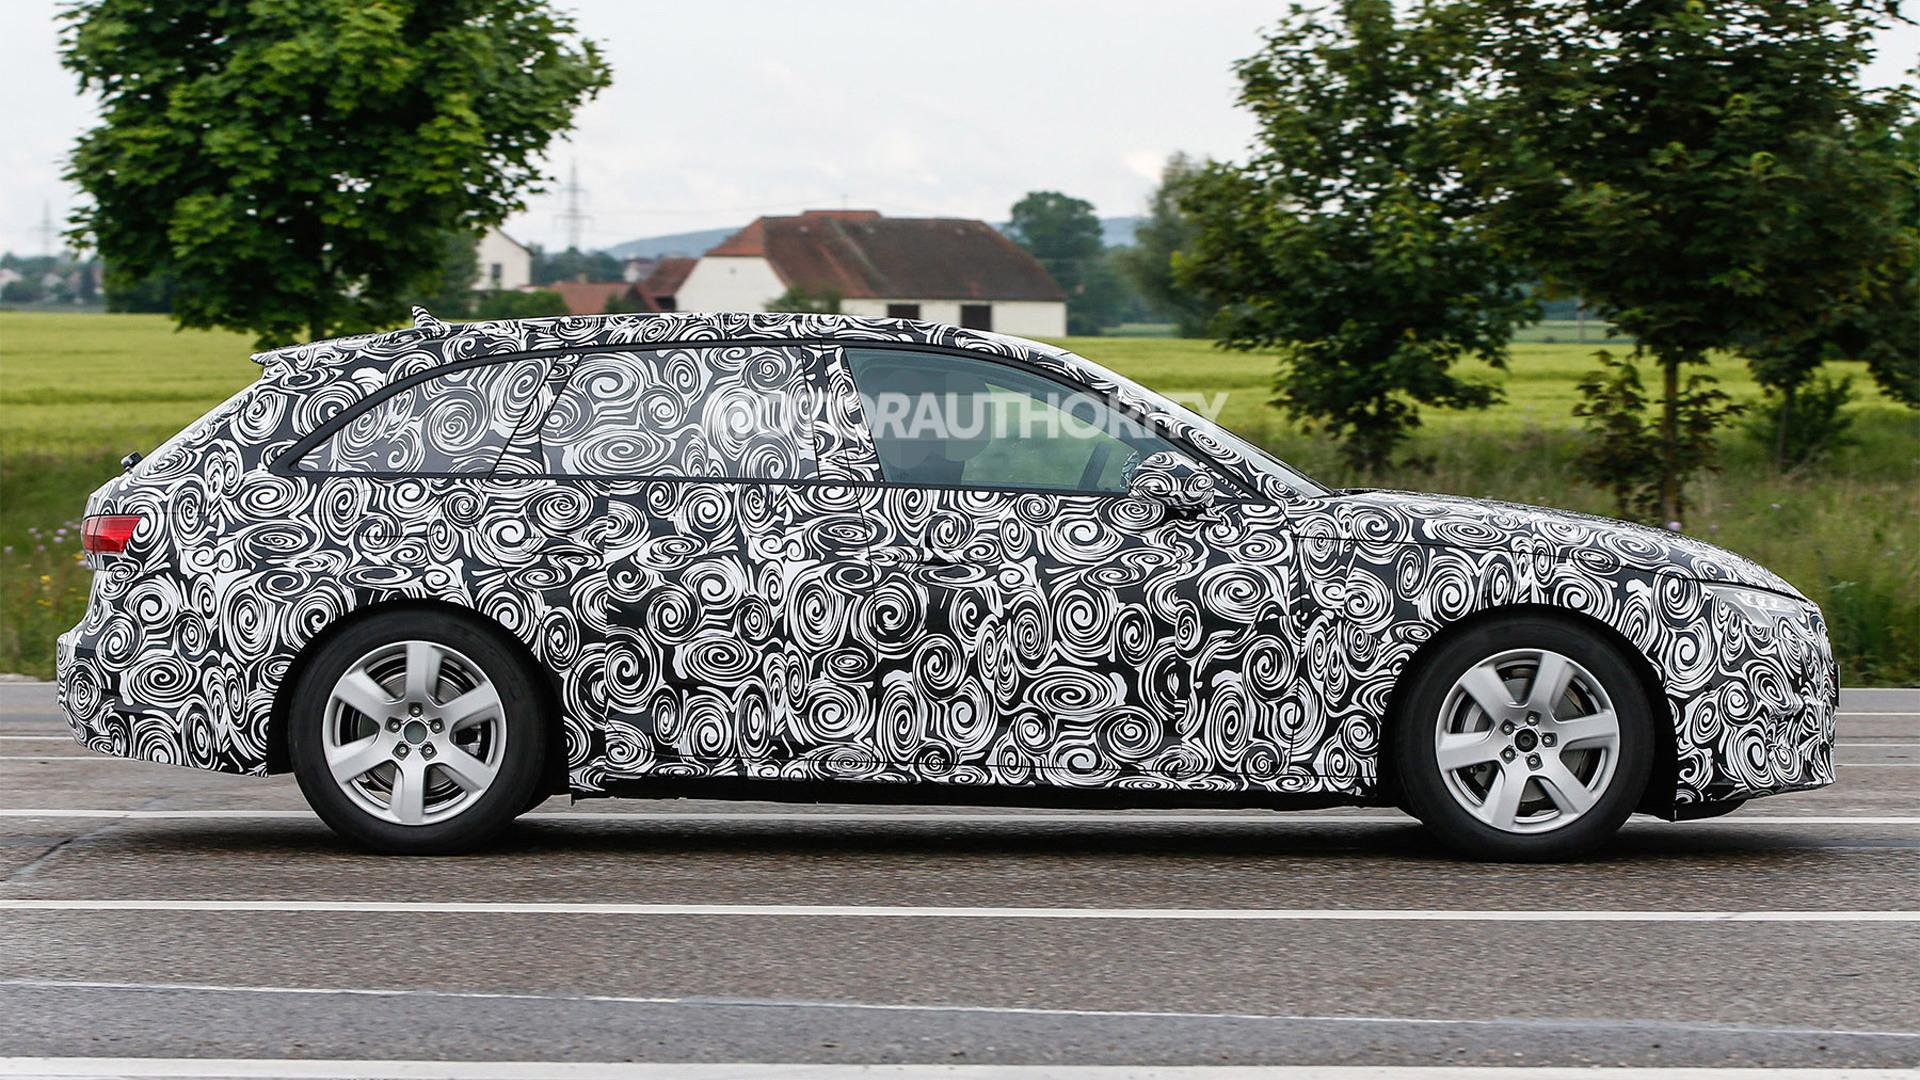 2017 Audi A4 Avant spy shots - Image via S. Baldauf/SB-Medien